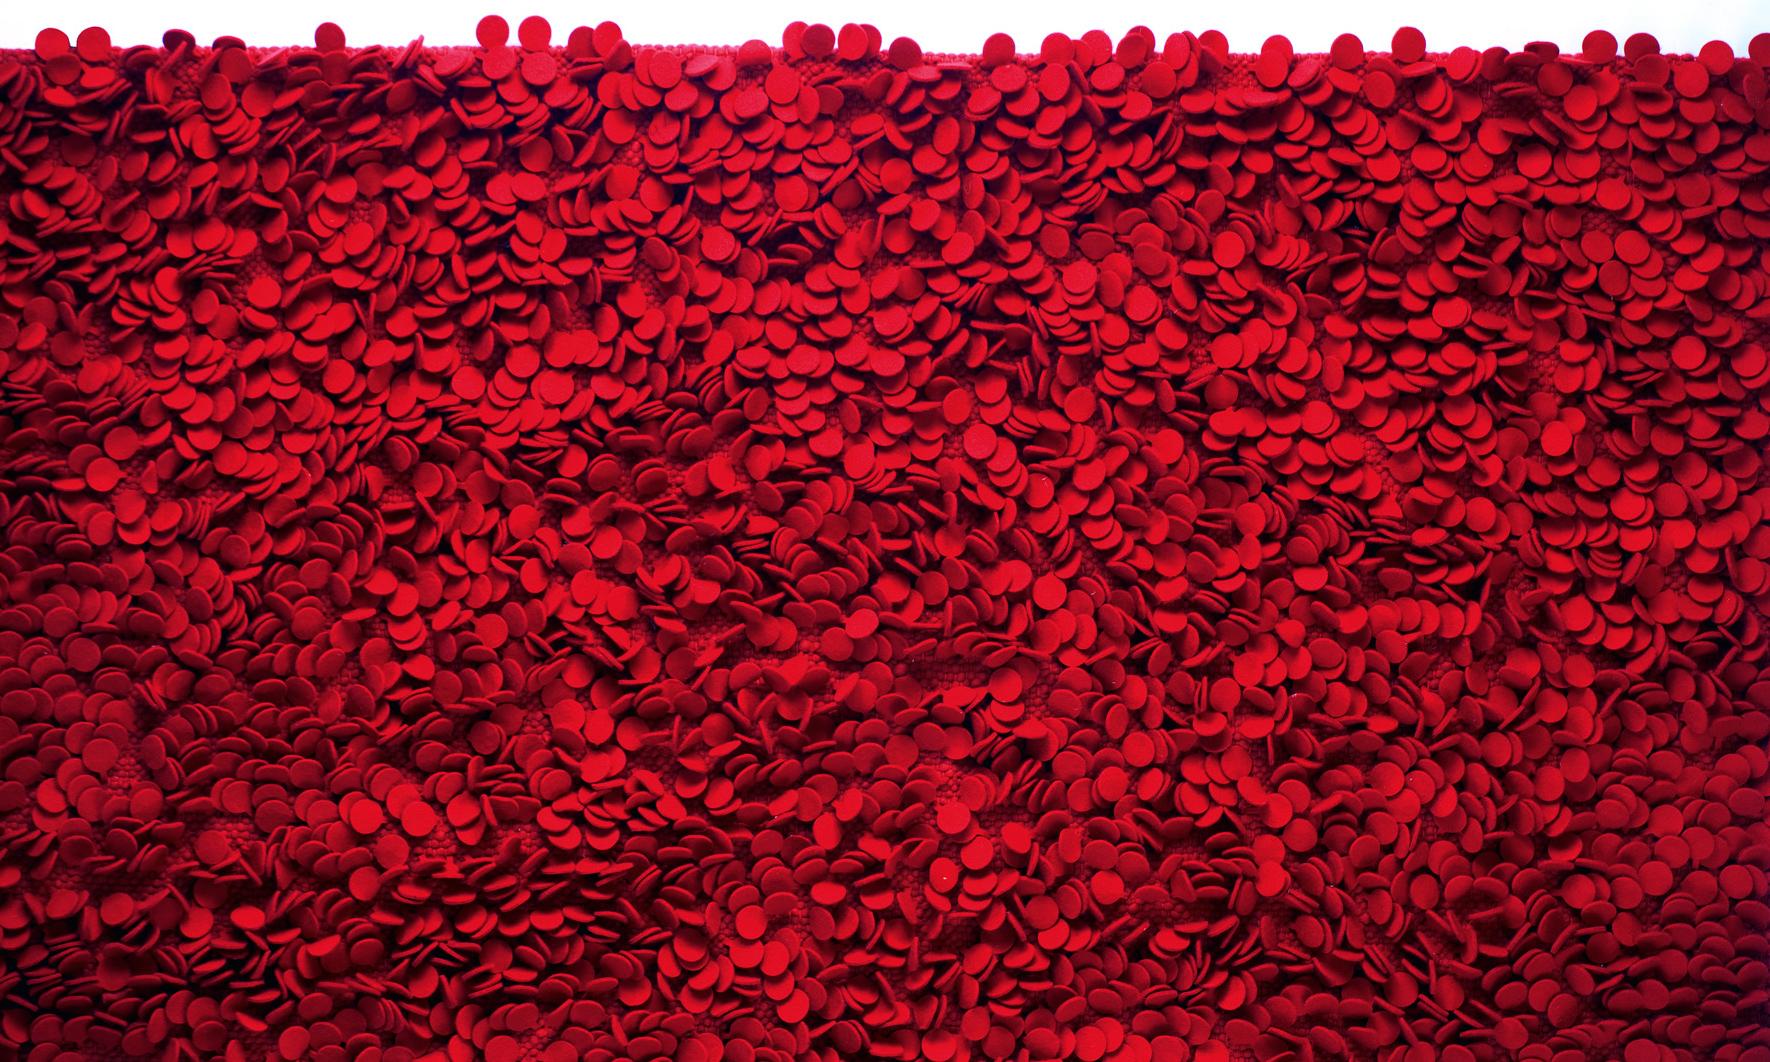 Rosas rug (detail) by nanimarquina